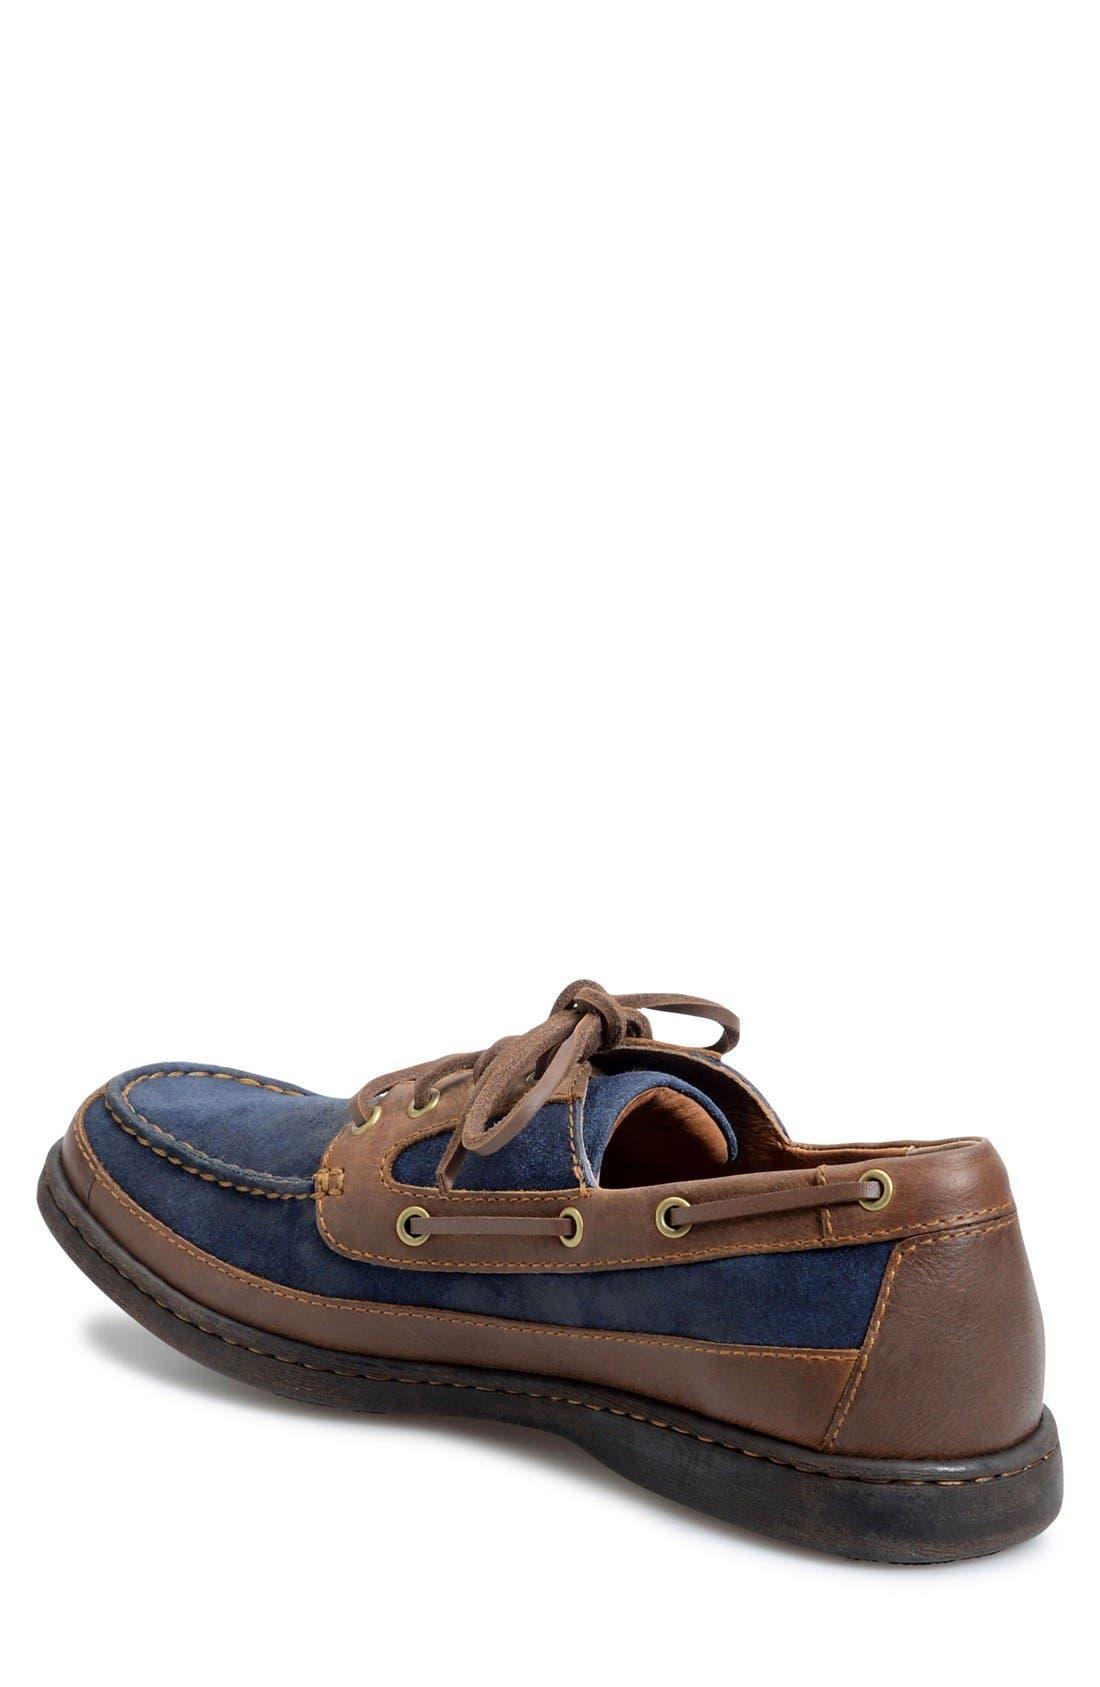 'Harwich' Boat Shoe,                             Alternate thumbnail 6, color,